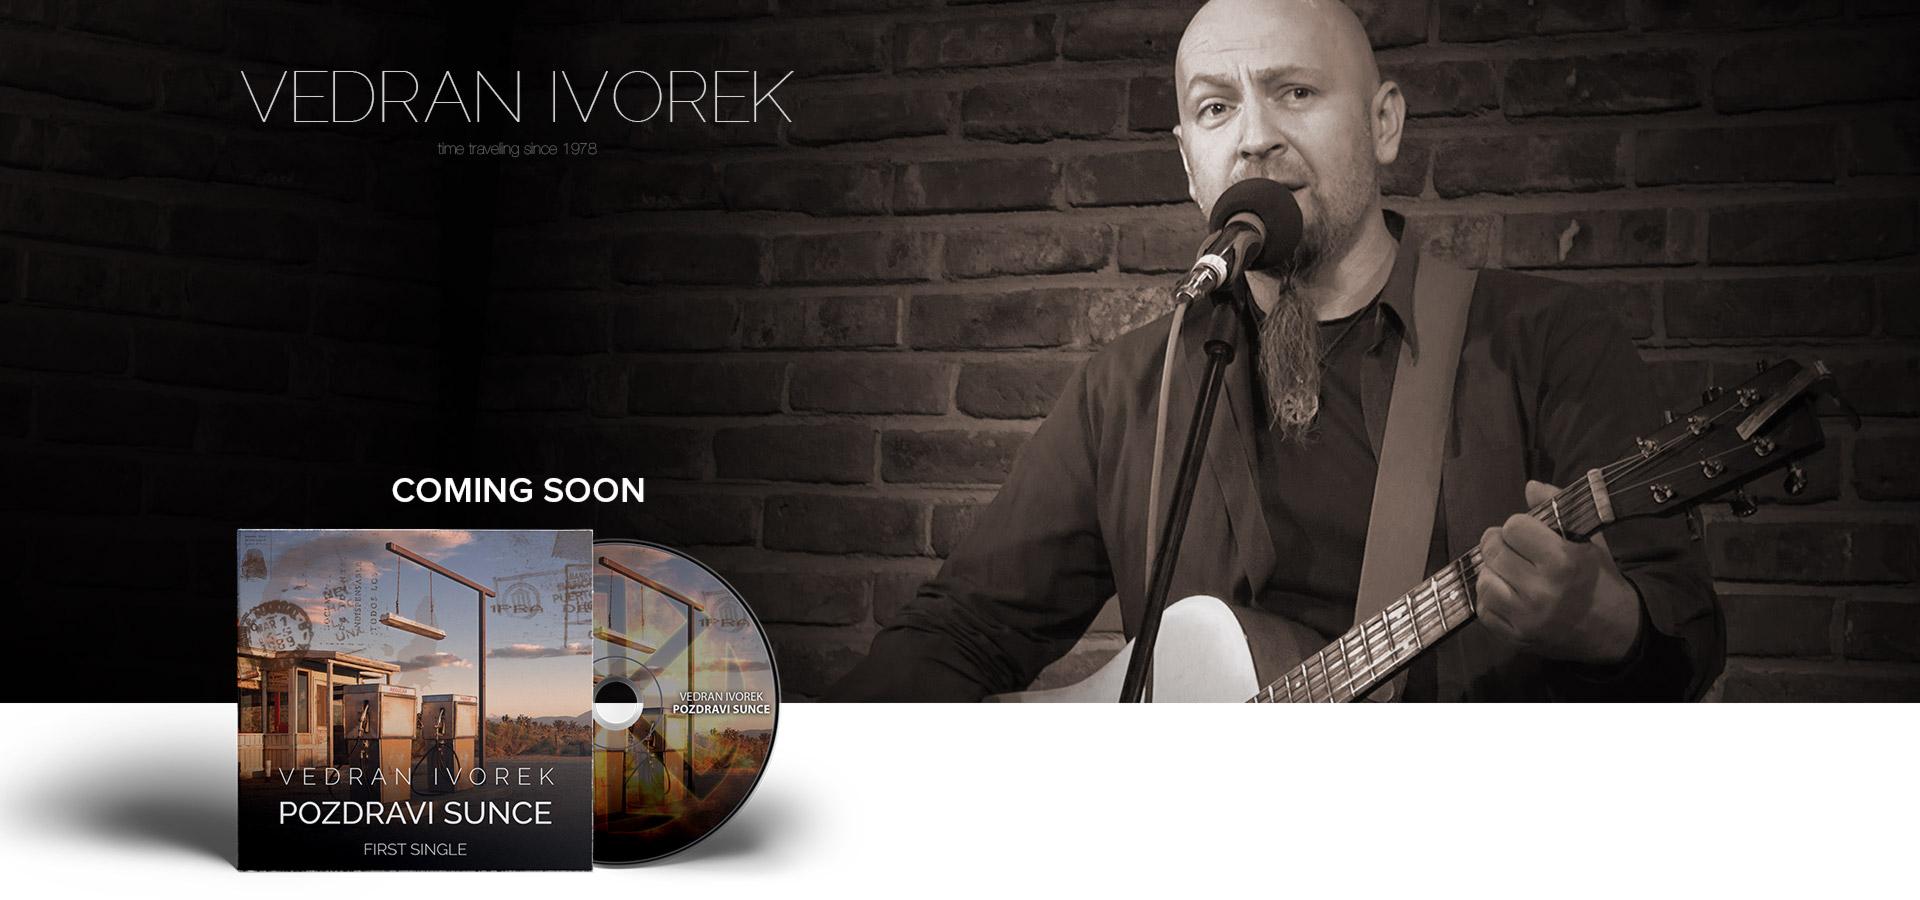 vedran-ivorek-tafra-kantautor-songwriter